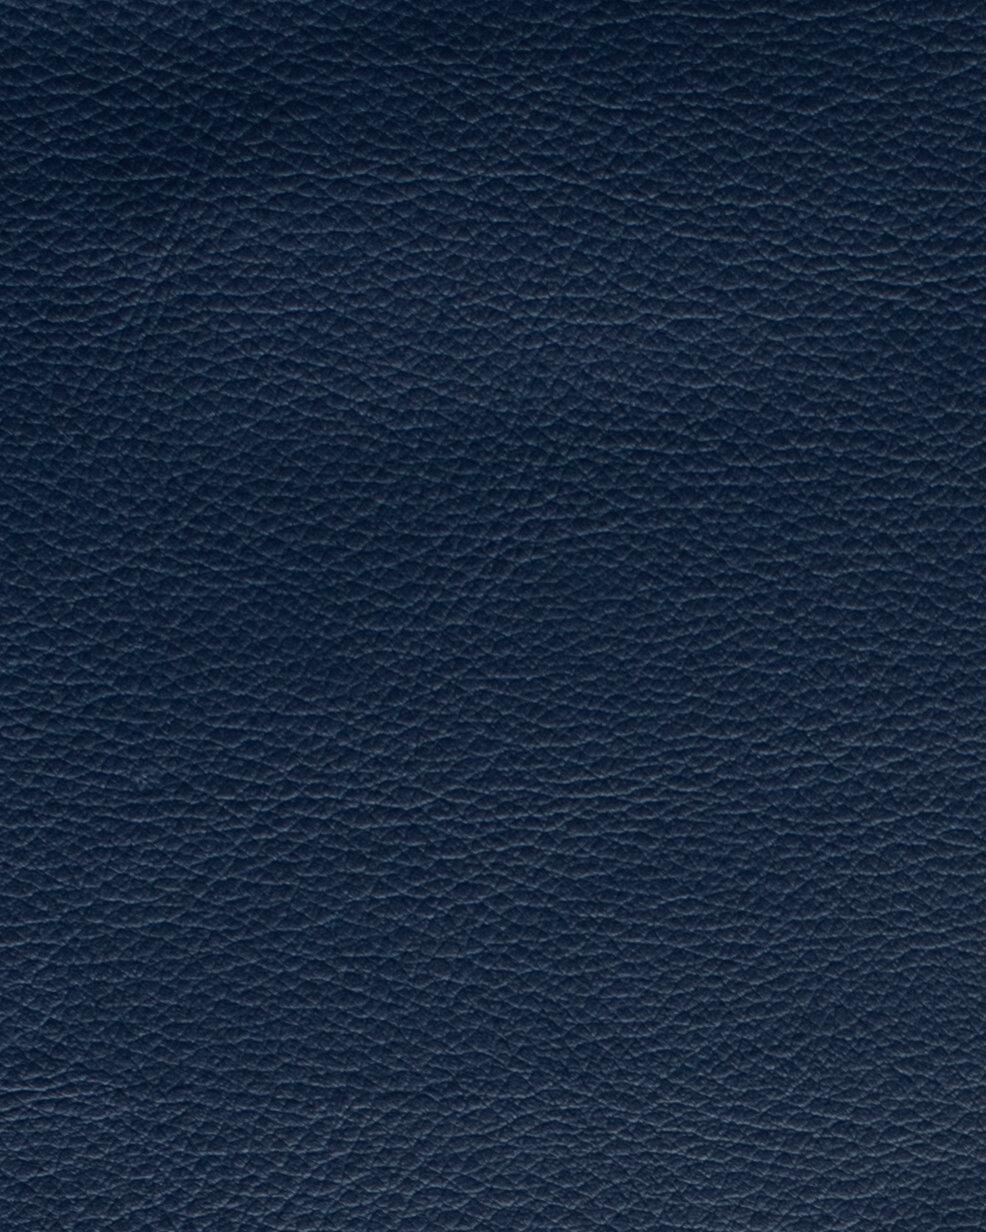 Faux Leather: Marine